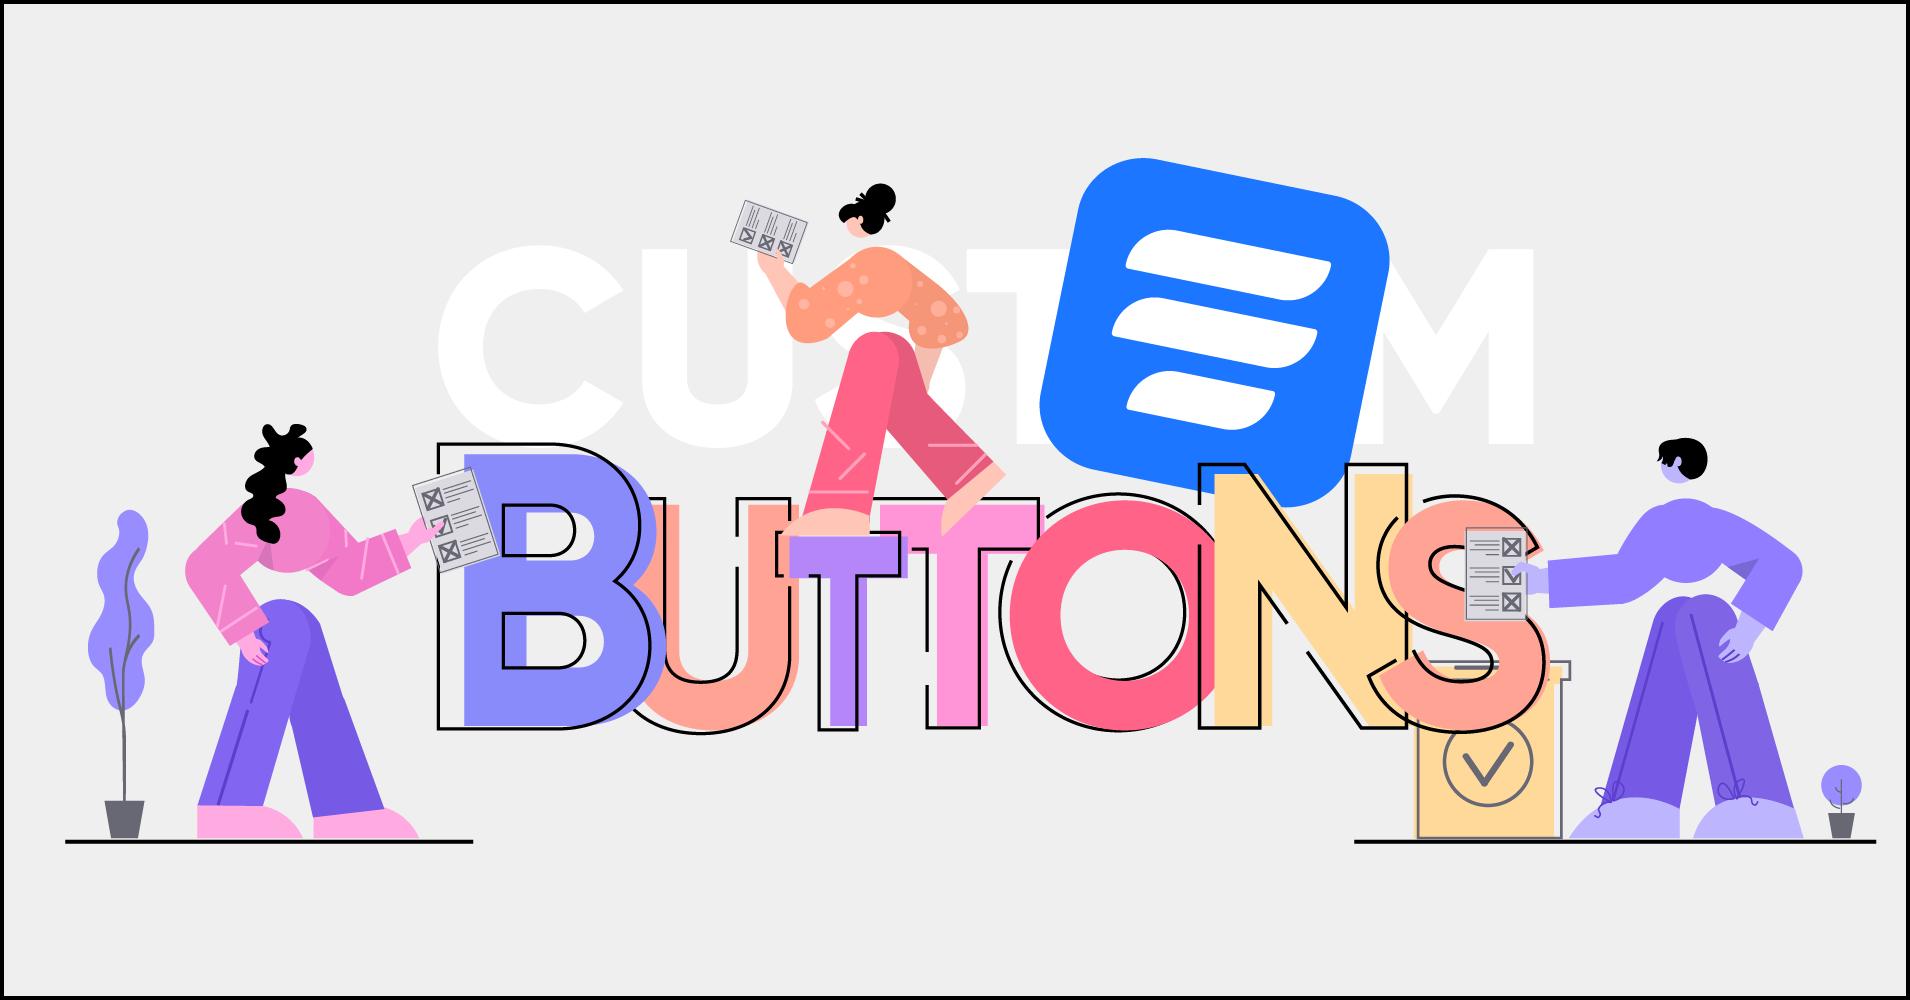 custom submit button